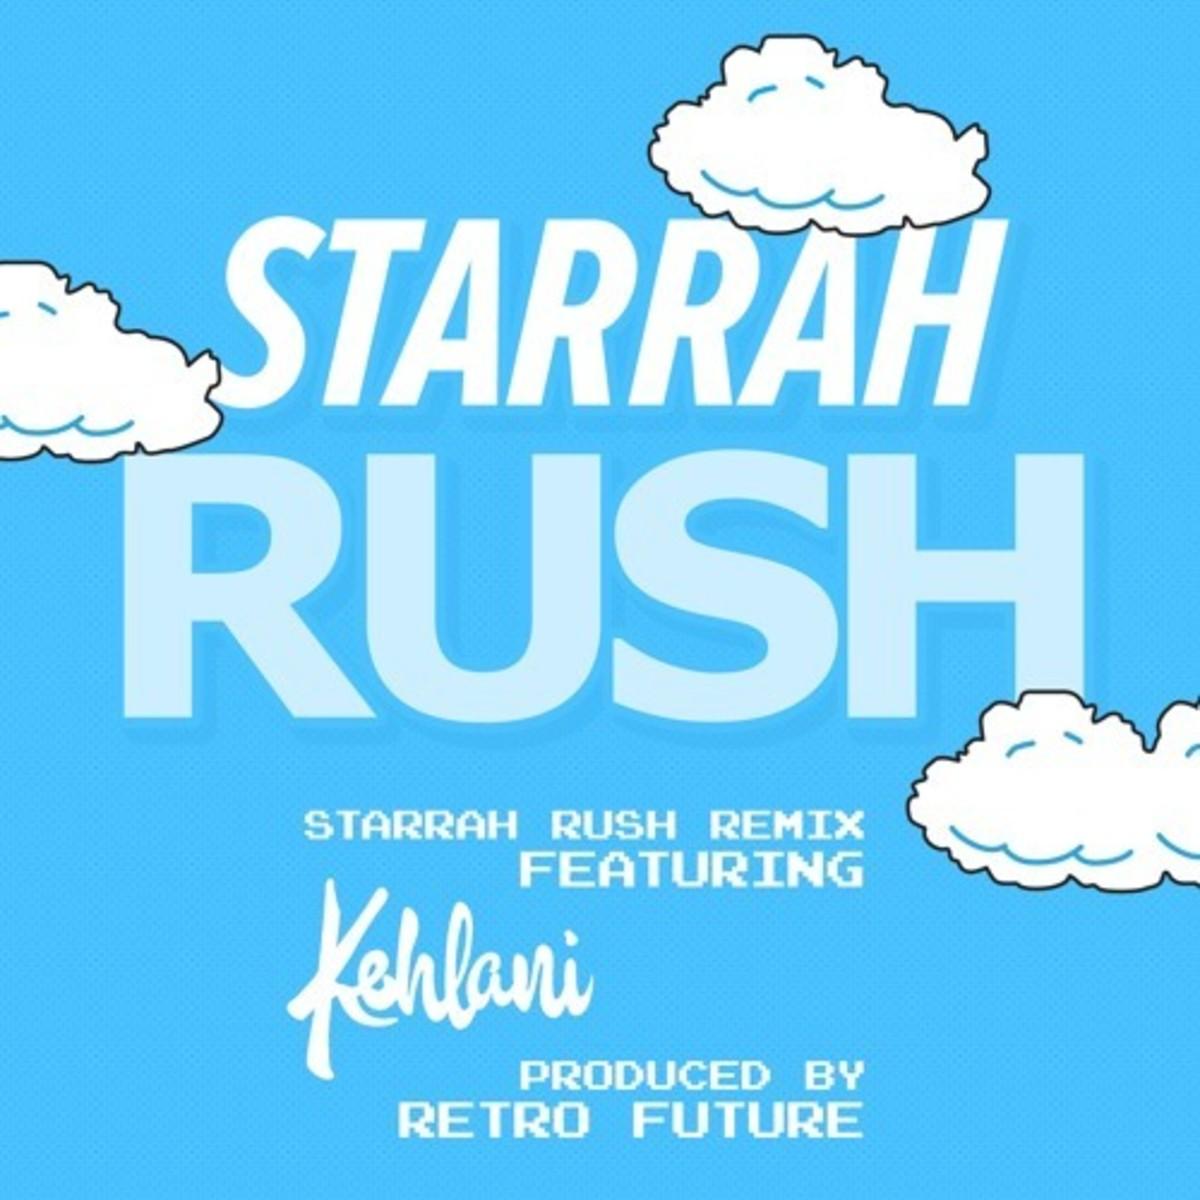 starrah-rush-remix.jpg